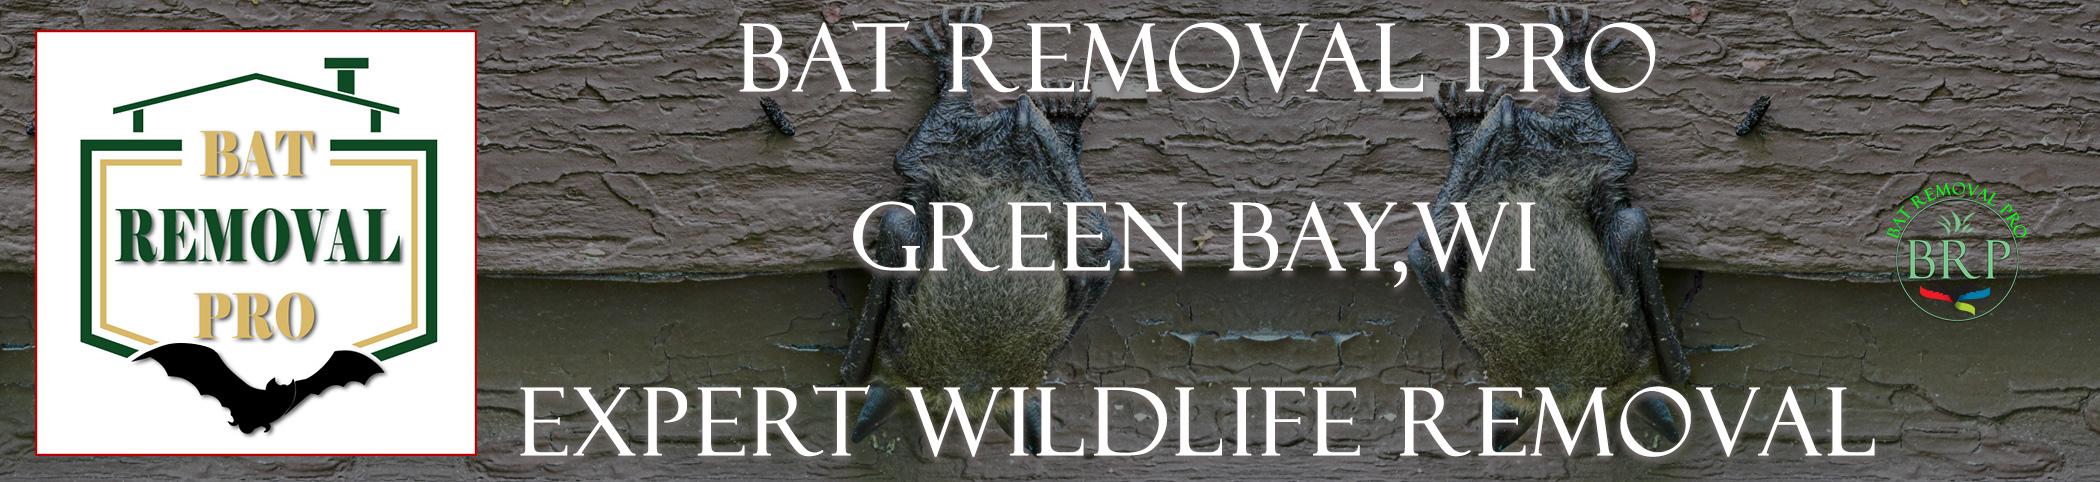 anchorage_alaska_HEADER_IMAGE bat removal pro